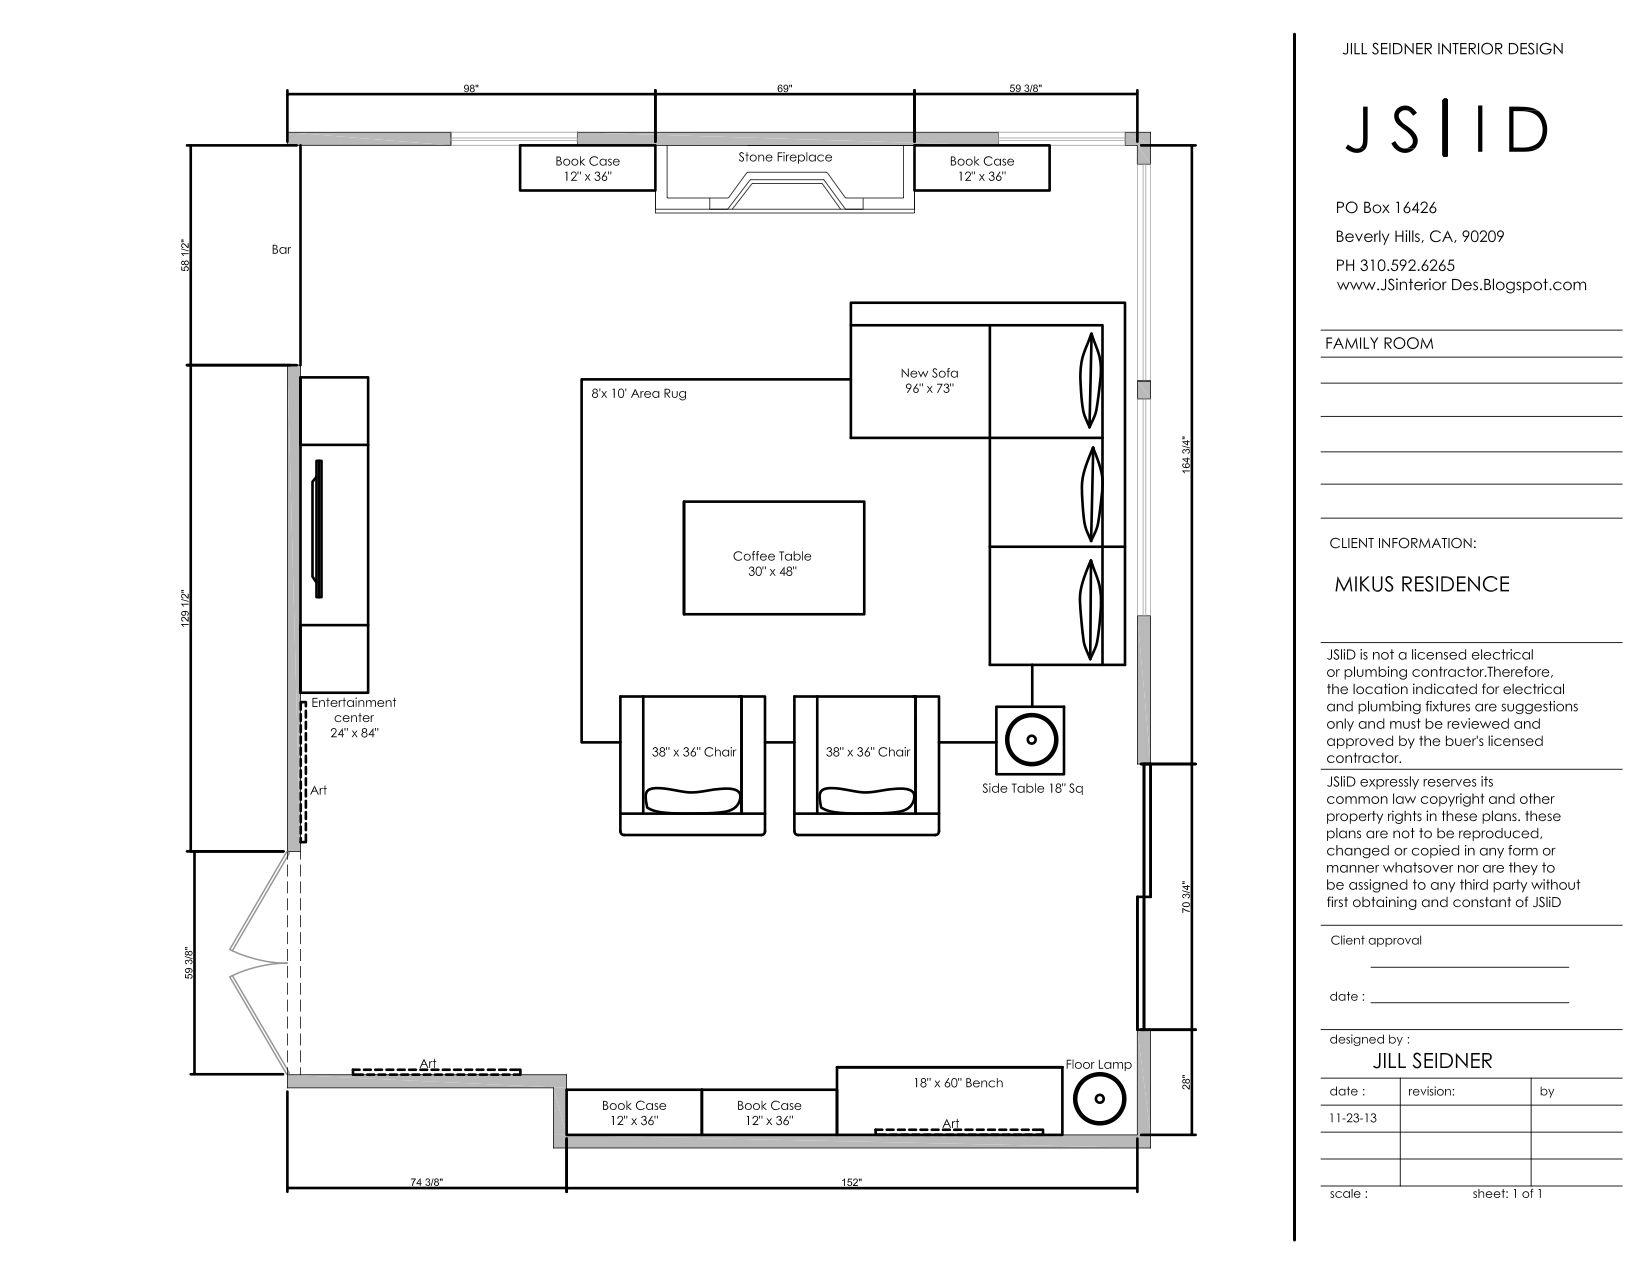 Online Design Project Family Room Furniture Floor Plan Layout Www Jsinteriordes Blogspot Com Family Room Family Room Furniture Arranging Bedroom Furniture